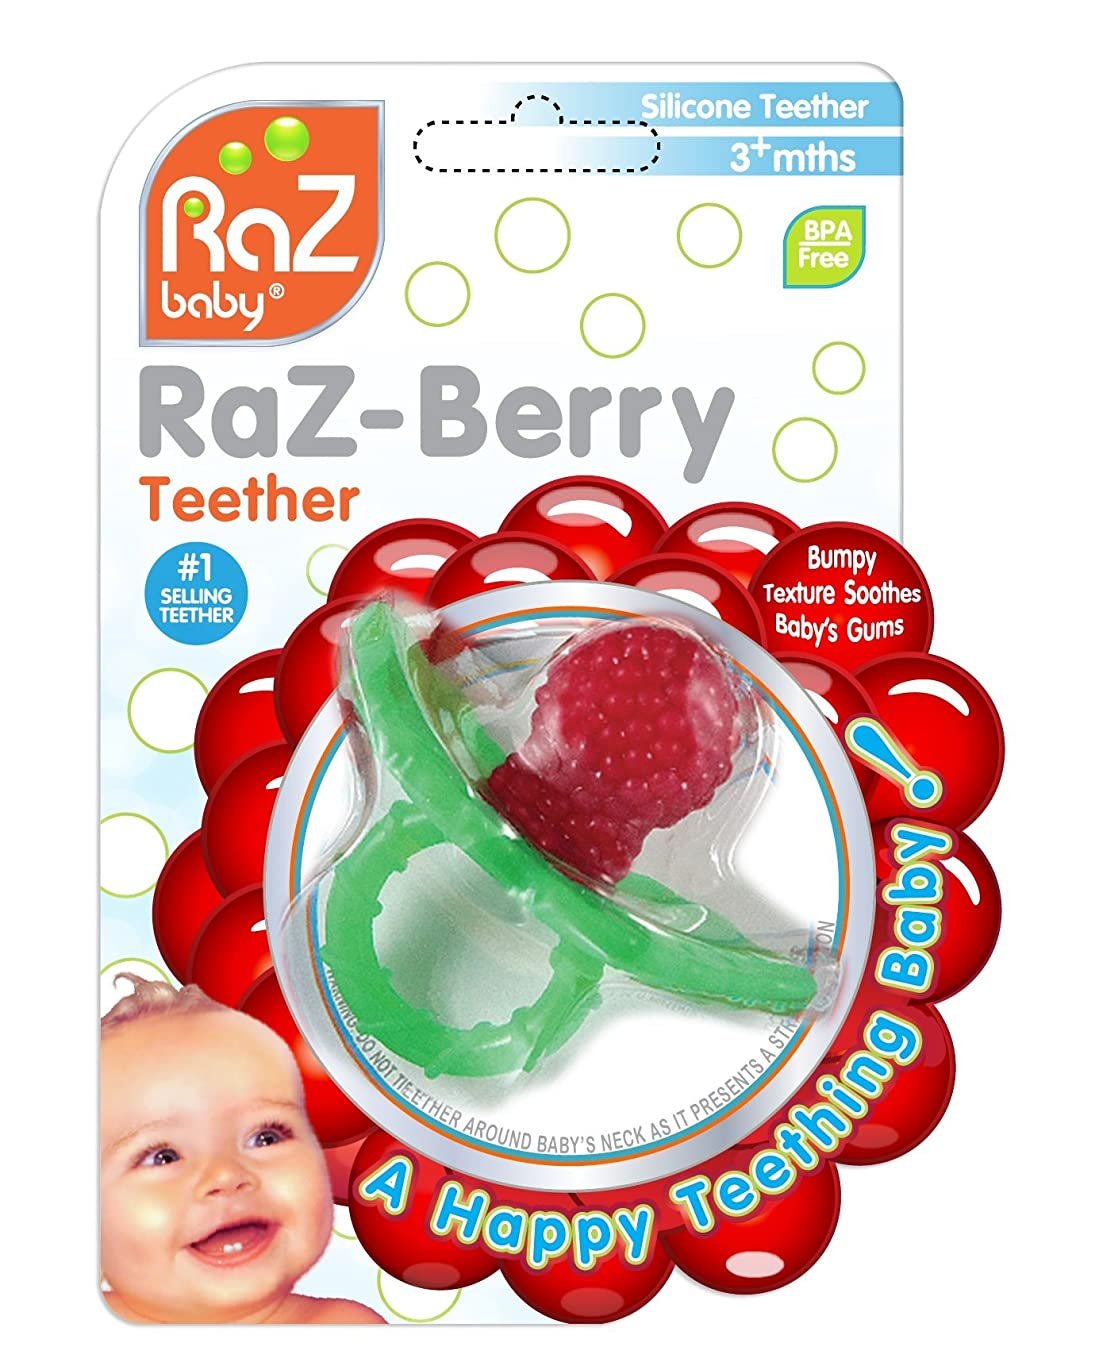 RaZbaby RaZ-Berry Silicone Teether/Multi-Texture Design/Hands Free Design/Red l09964179